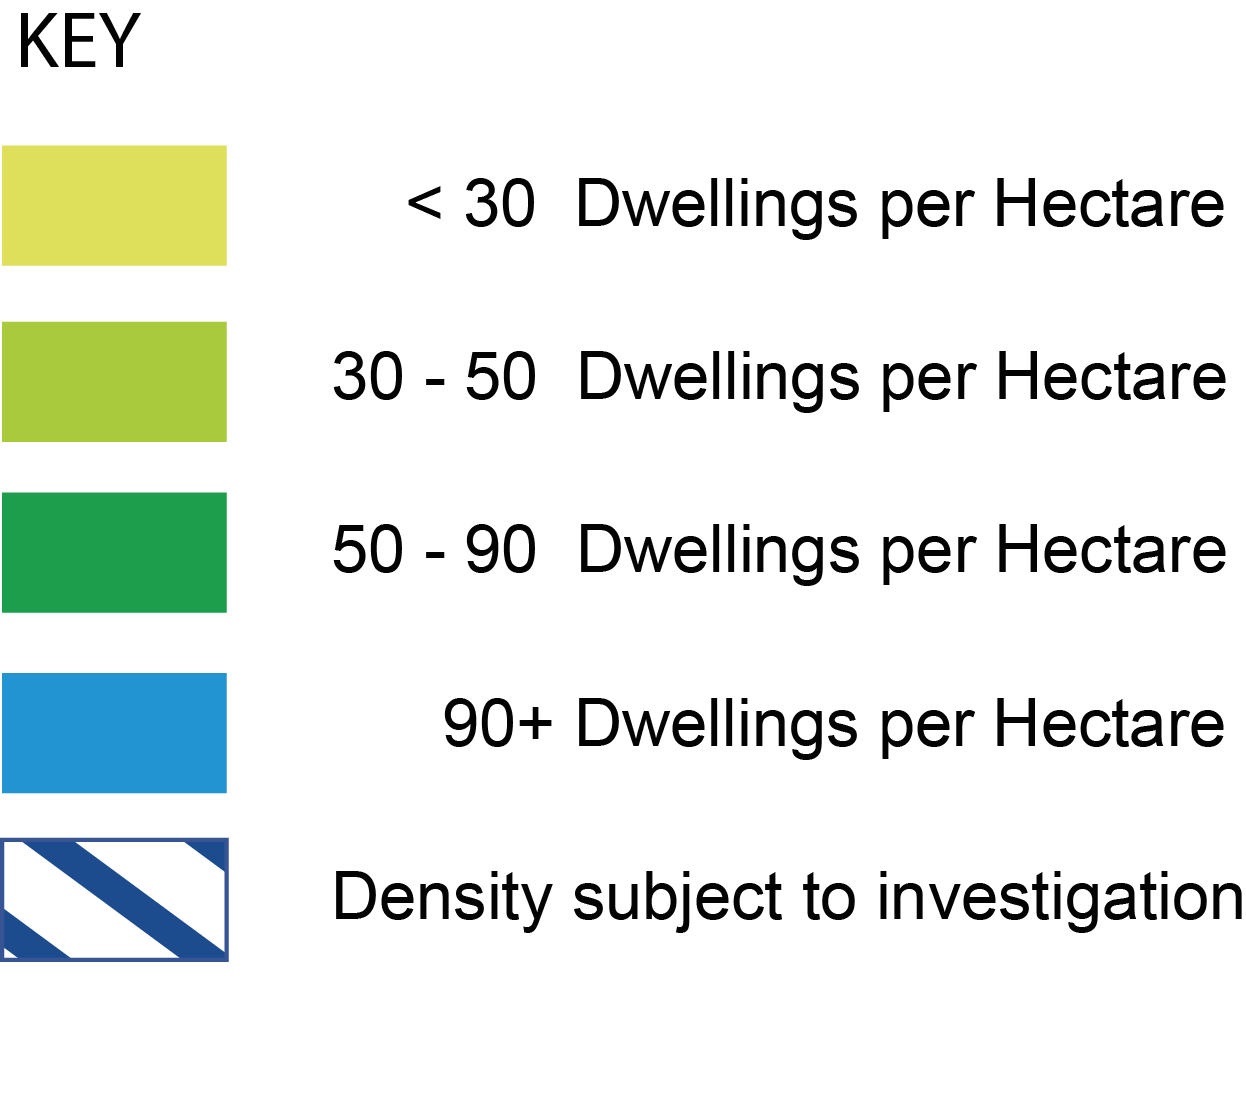 IF_3_Density-Key.png